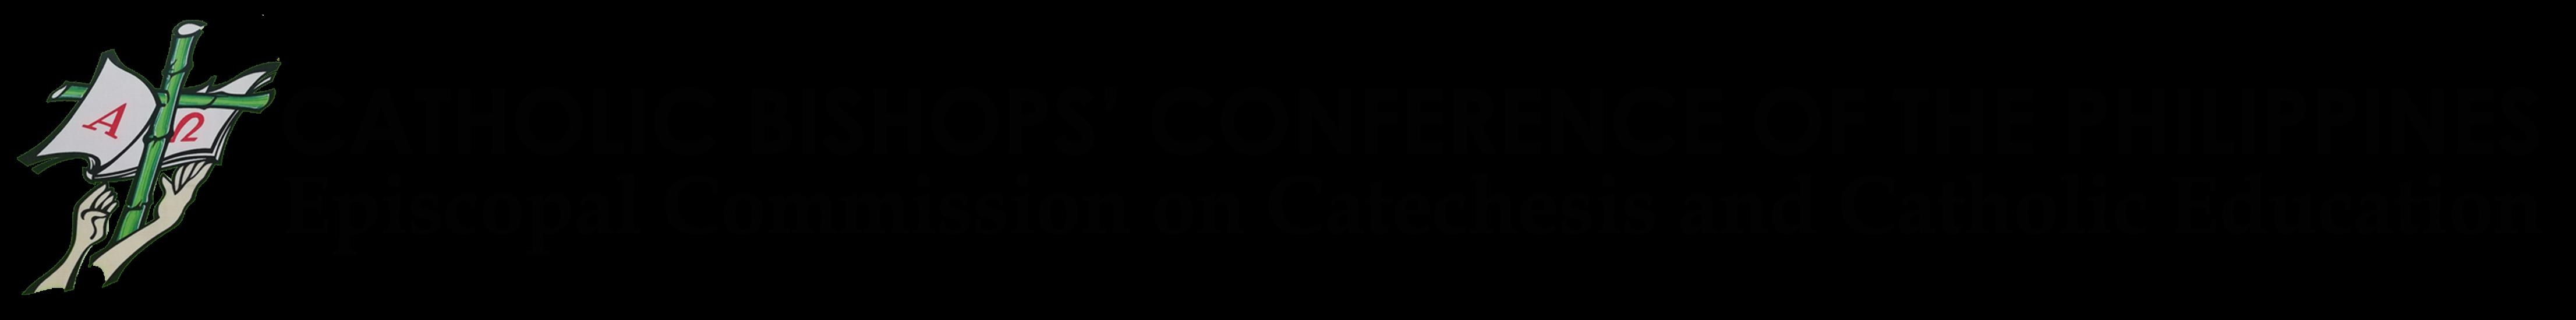 CBCP-ECCCE Website